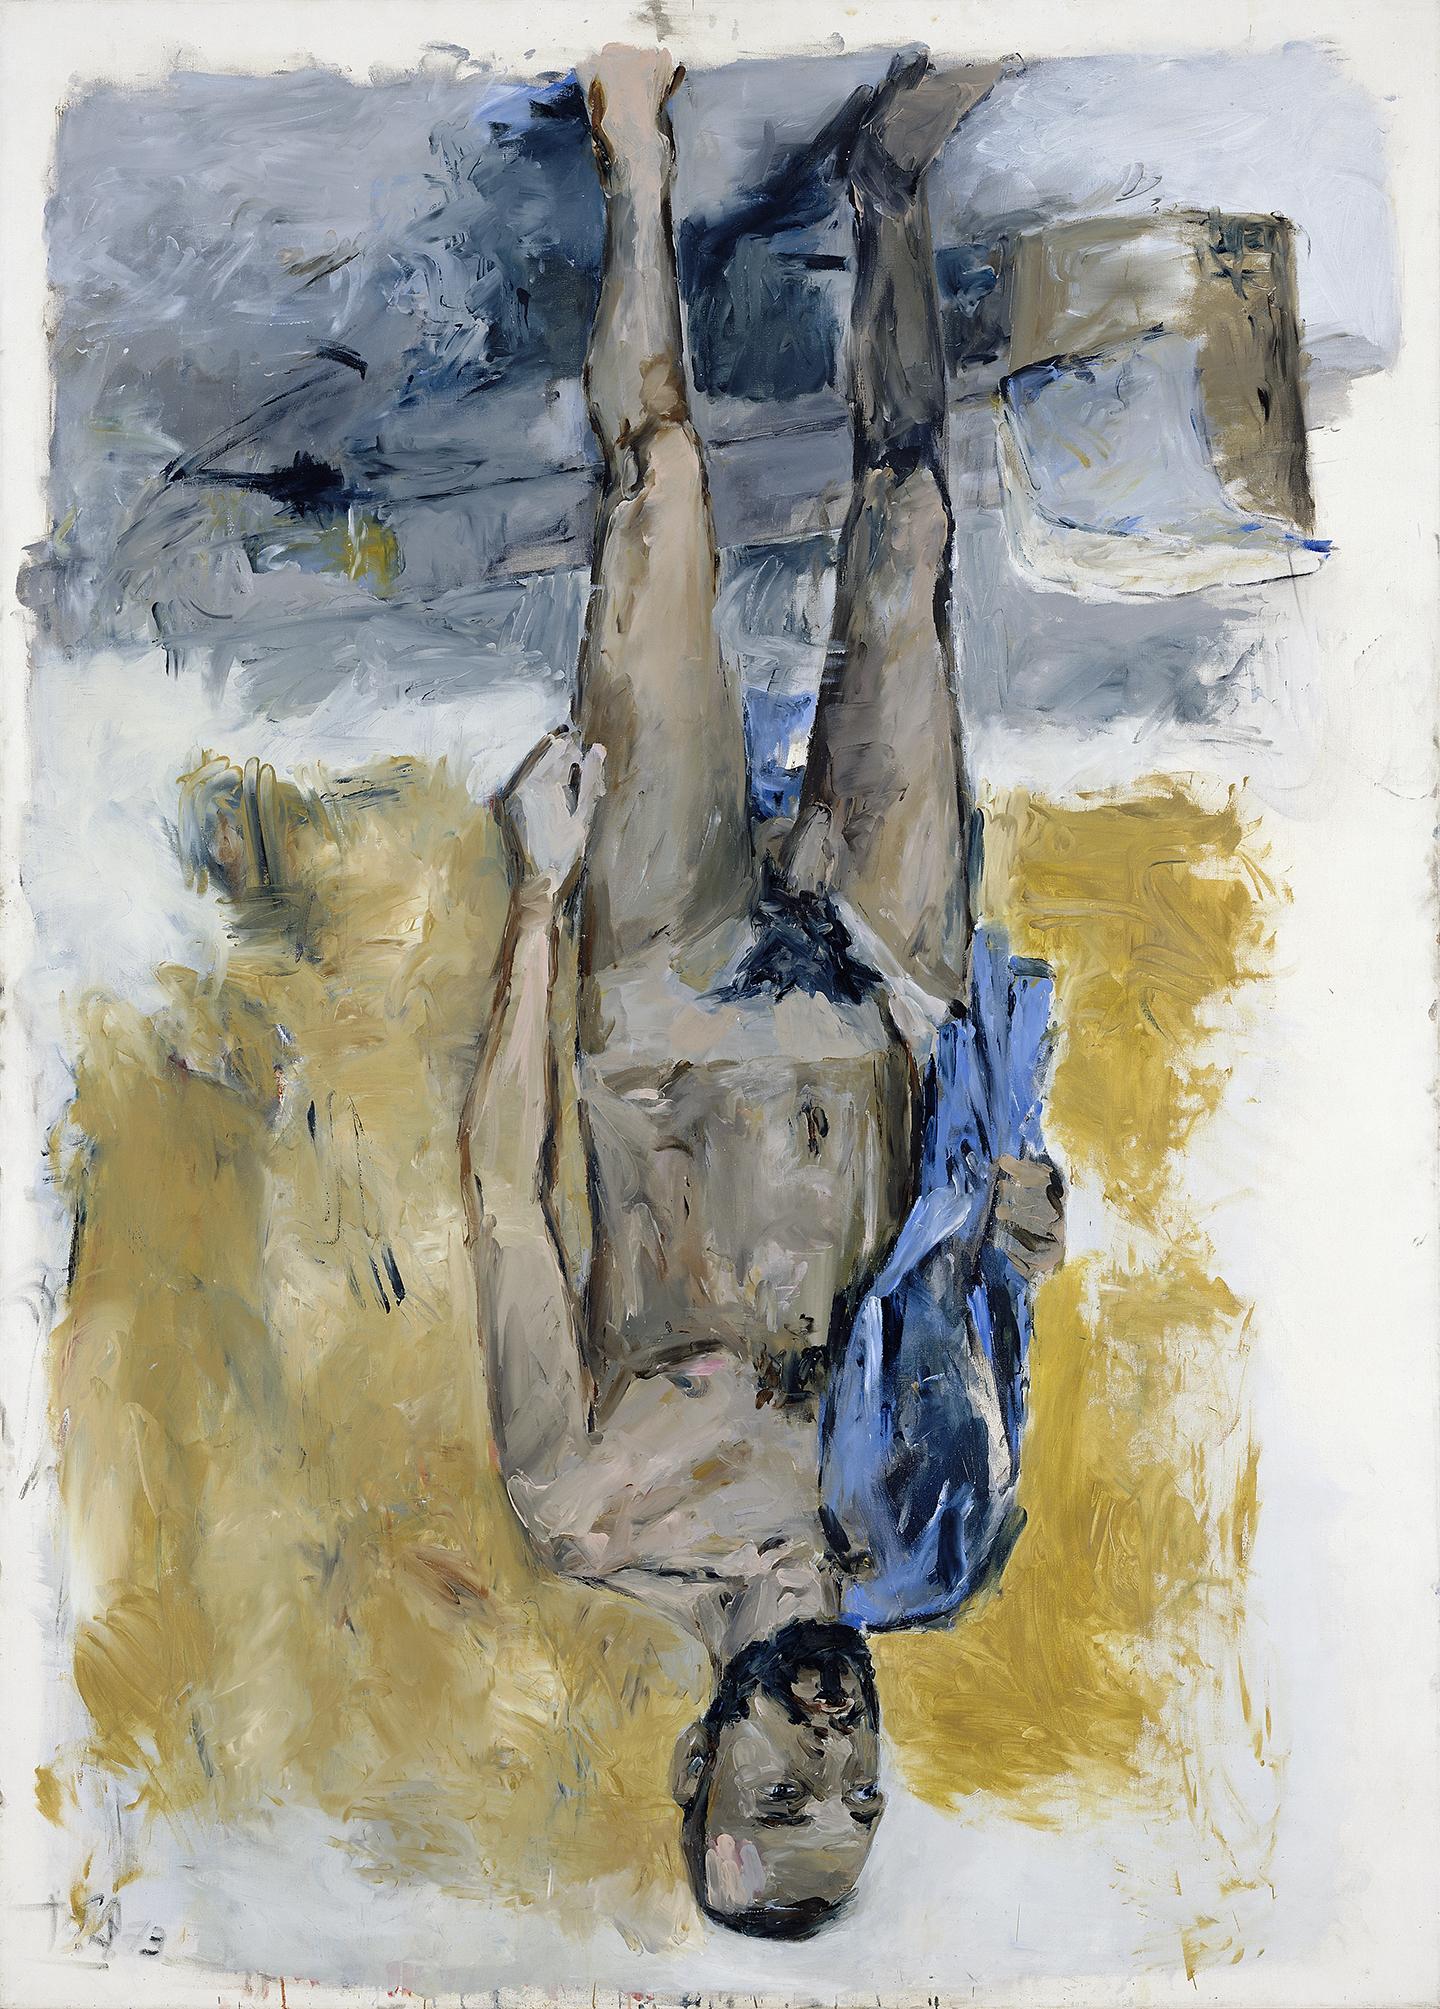 Georg Baselitz, Fingermalerei - Akt (Pintur a dedo – Desnudo), 1973